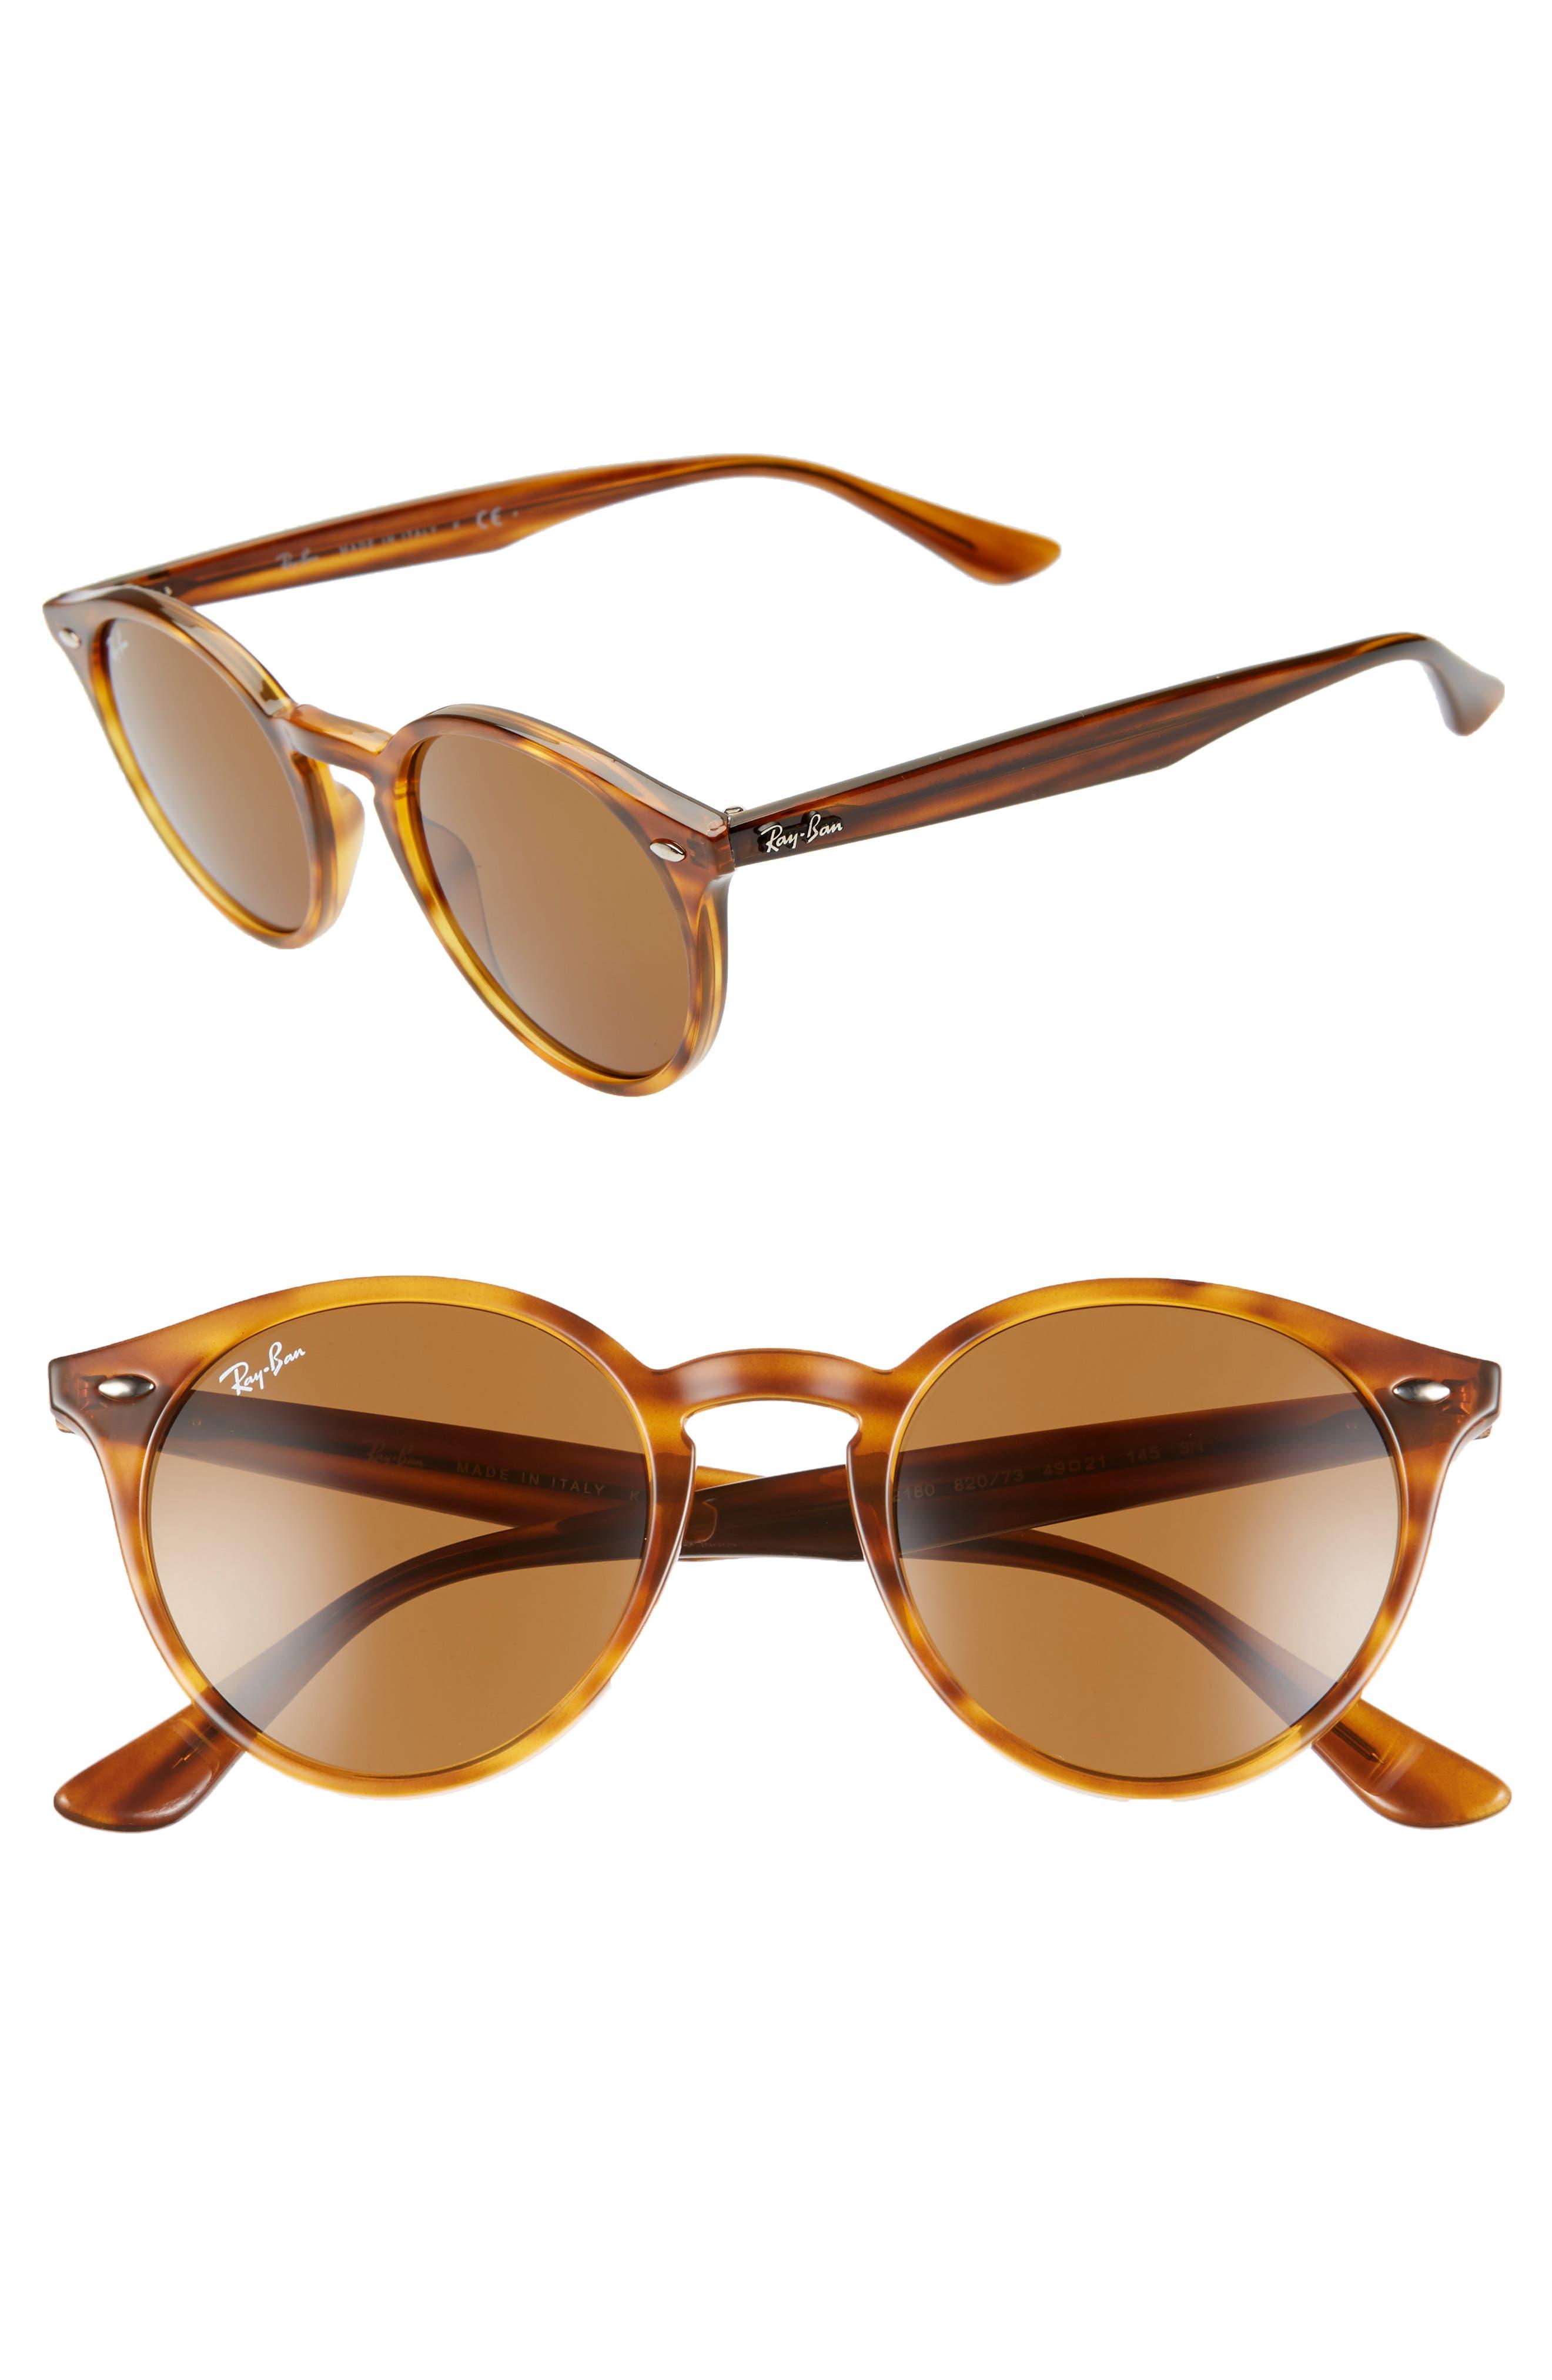 e40b877c9024 Ray-Ban Highstreet Round Sunglasses - Red Havana/ Brown Solid